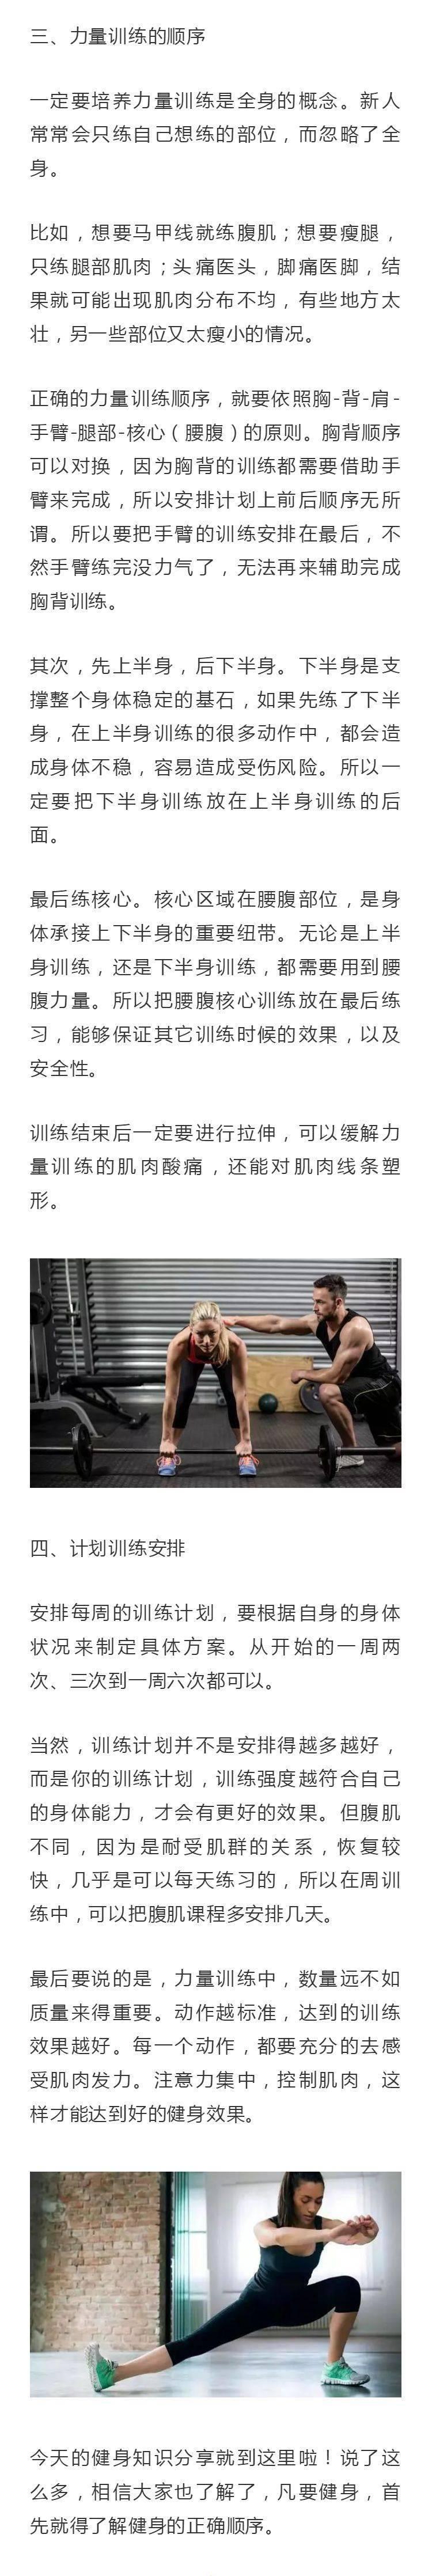 菲娱待遇-首页【1.1.45】